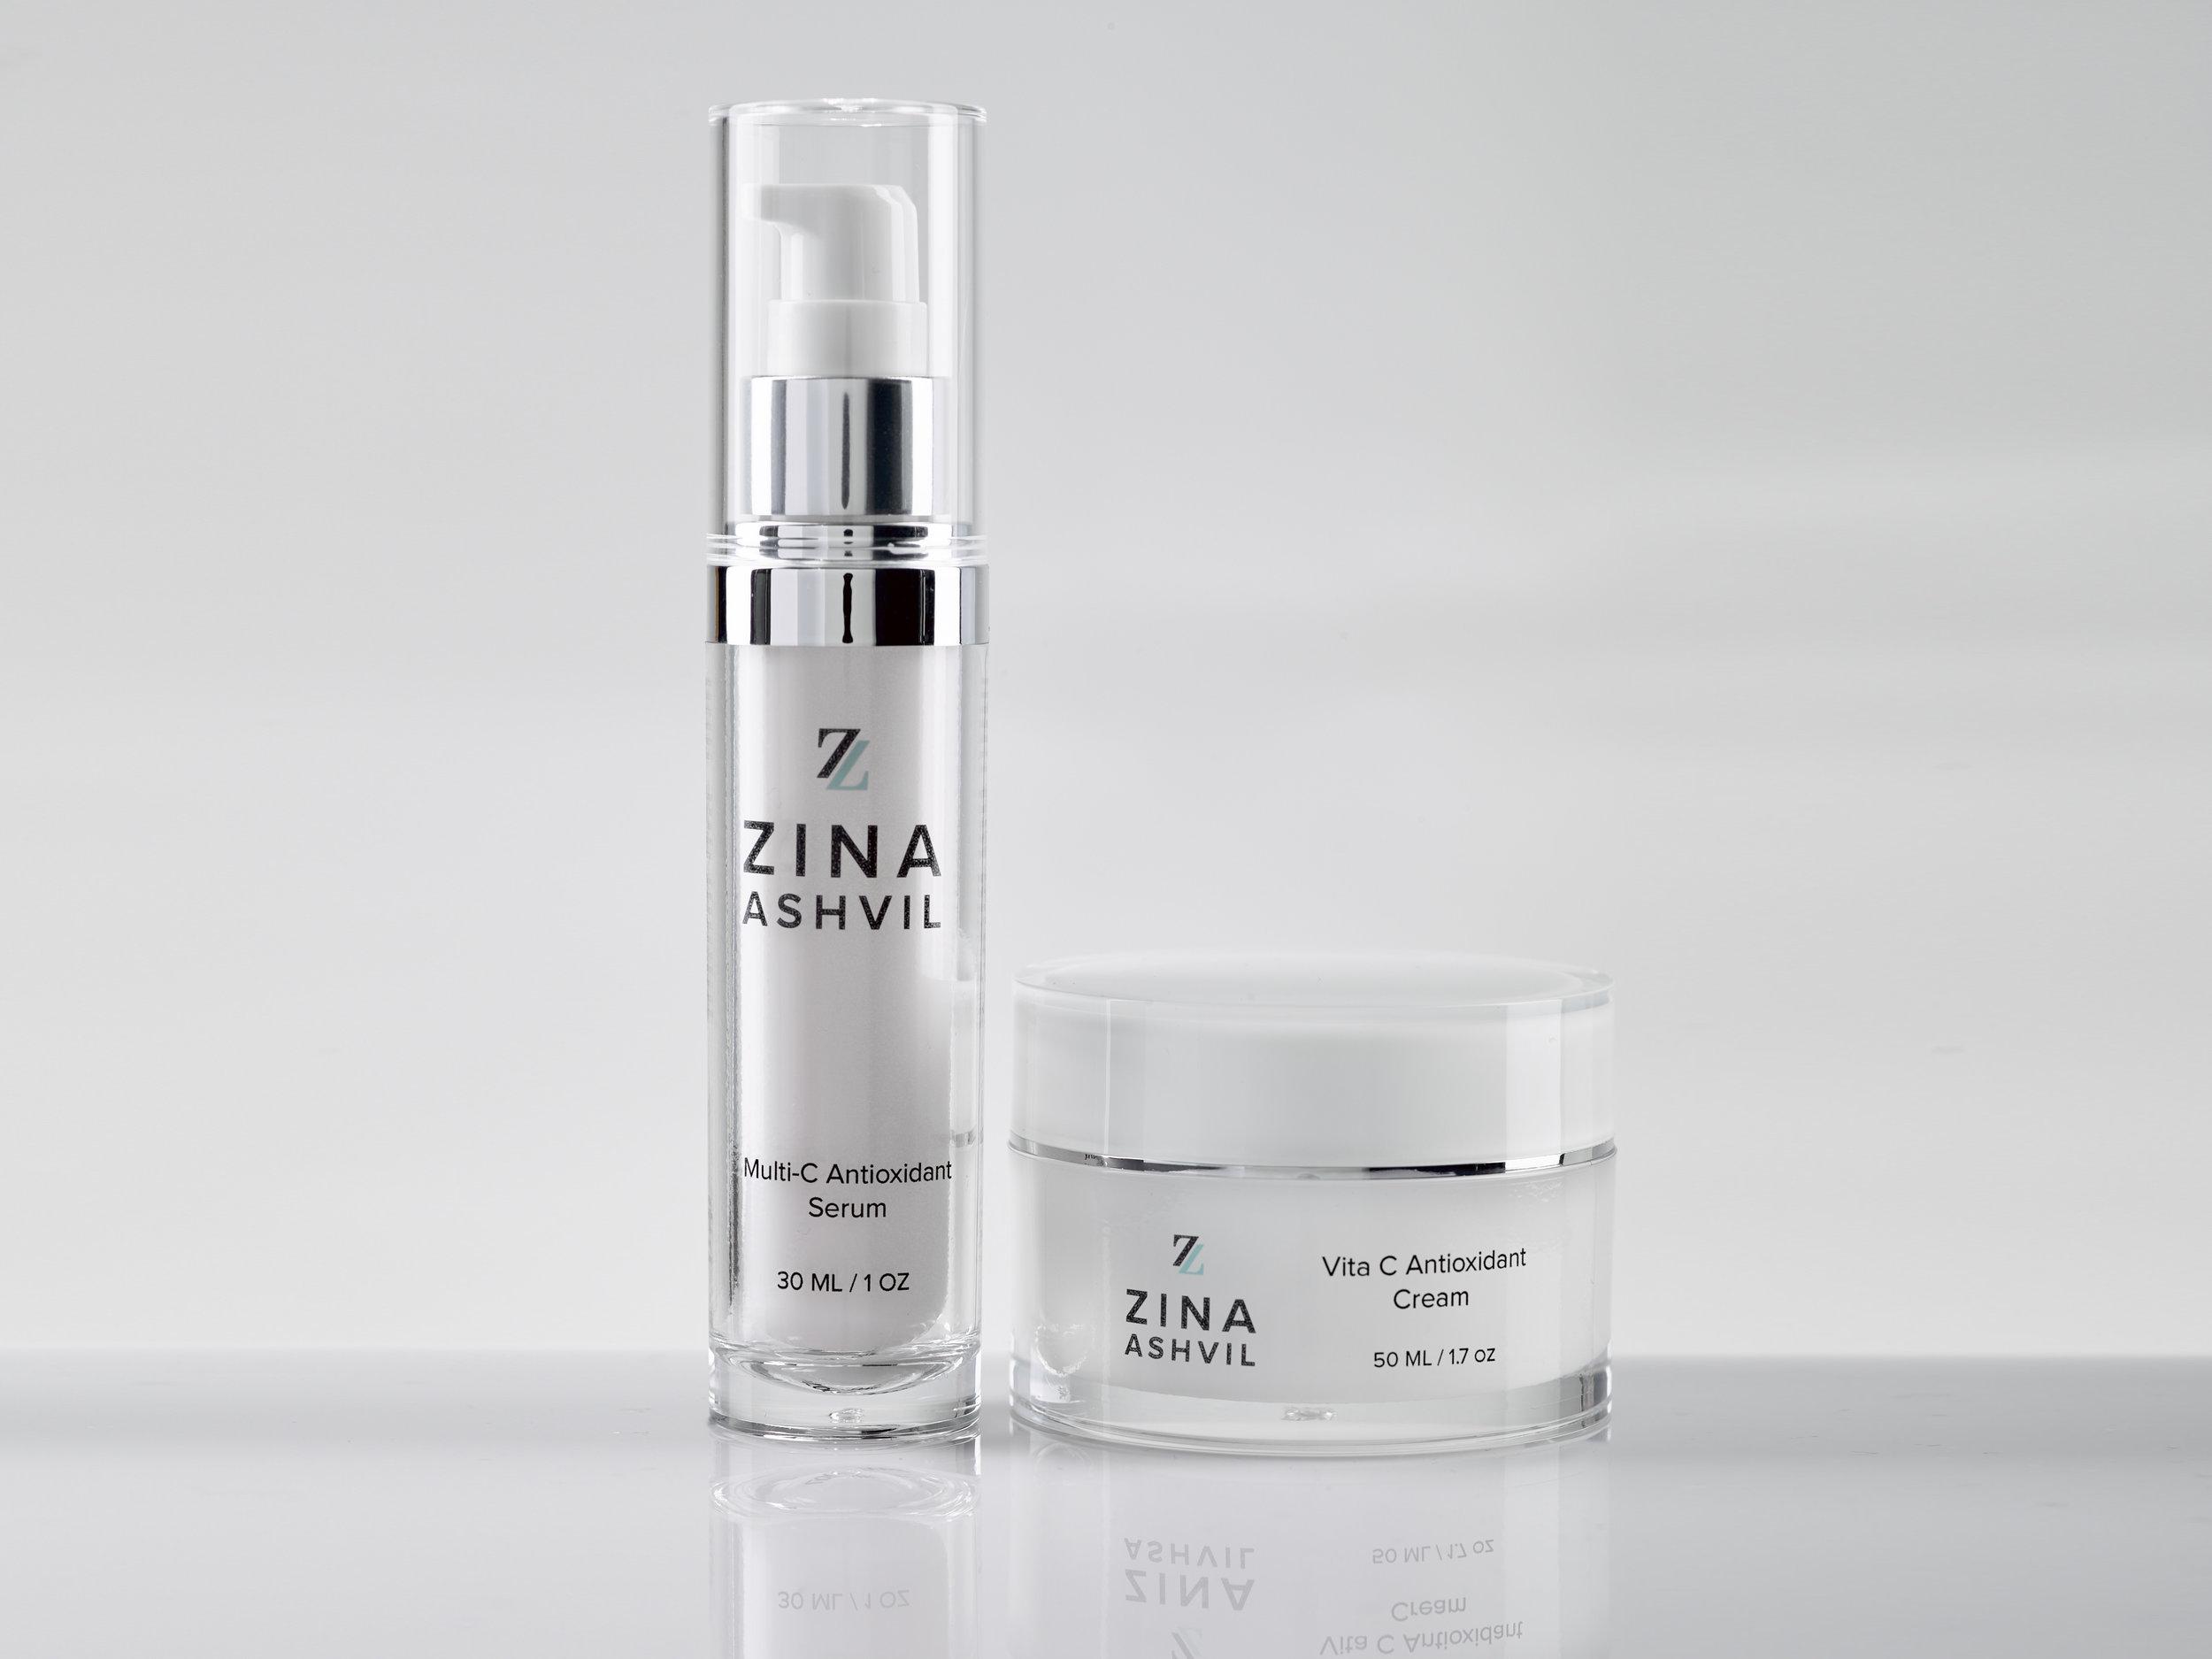 zina ashvil skincare products-multi-c serum and vita c cream.jpg